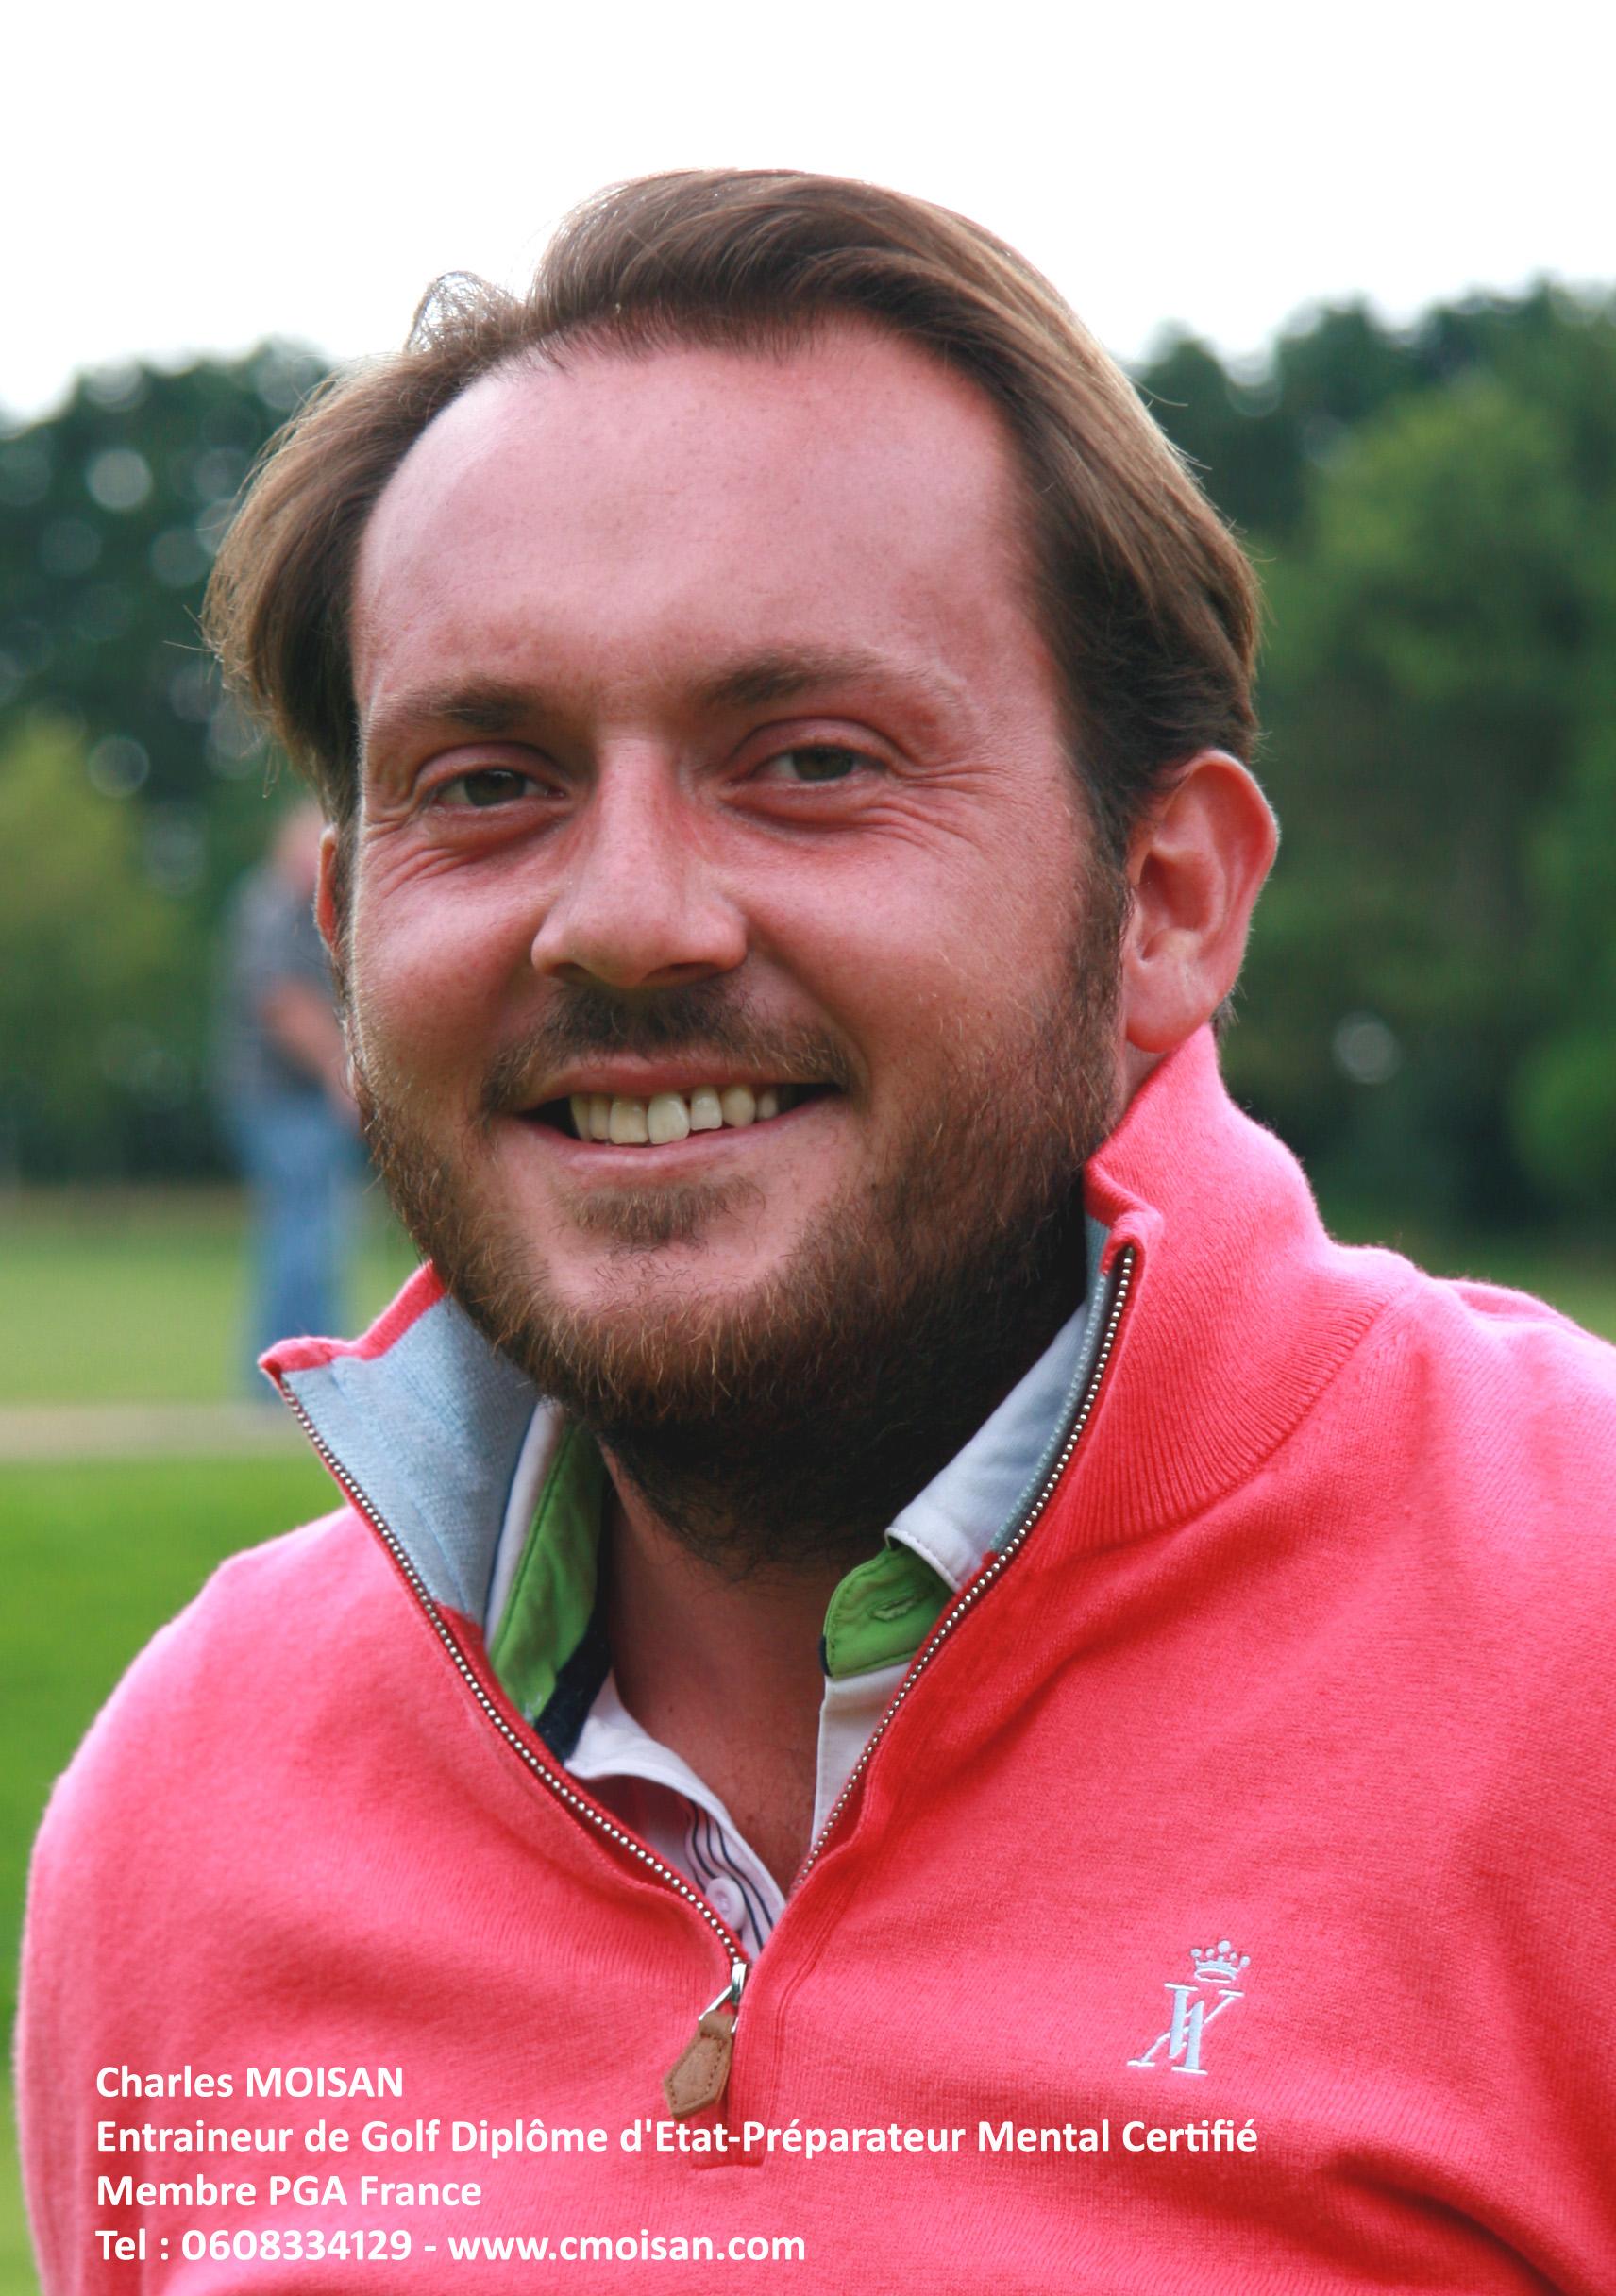 Charles MOISAN golf de Salouel (6)